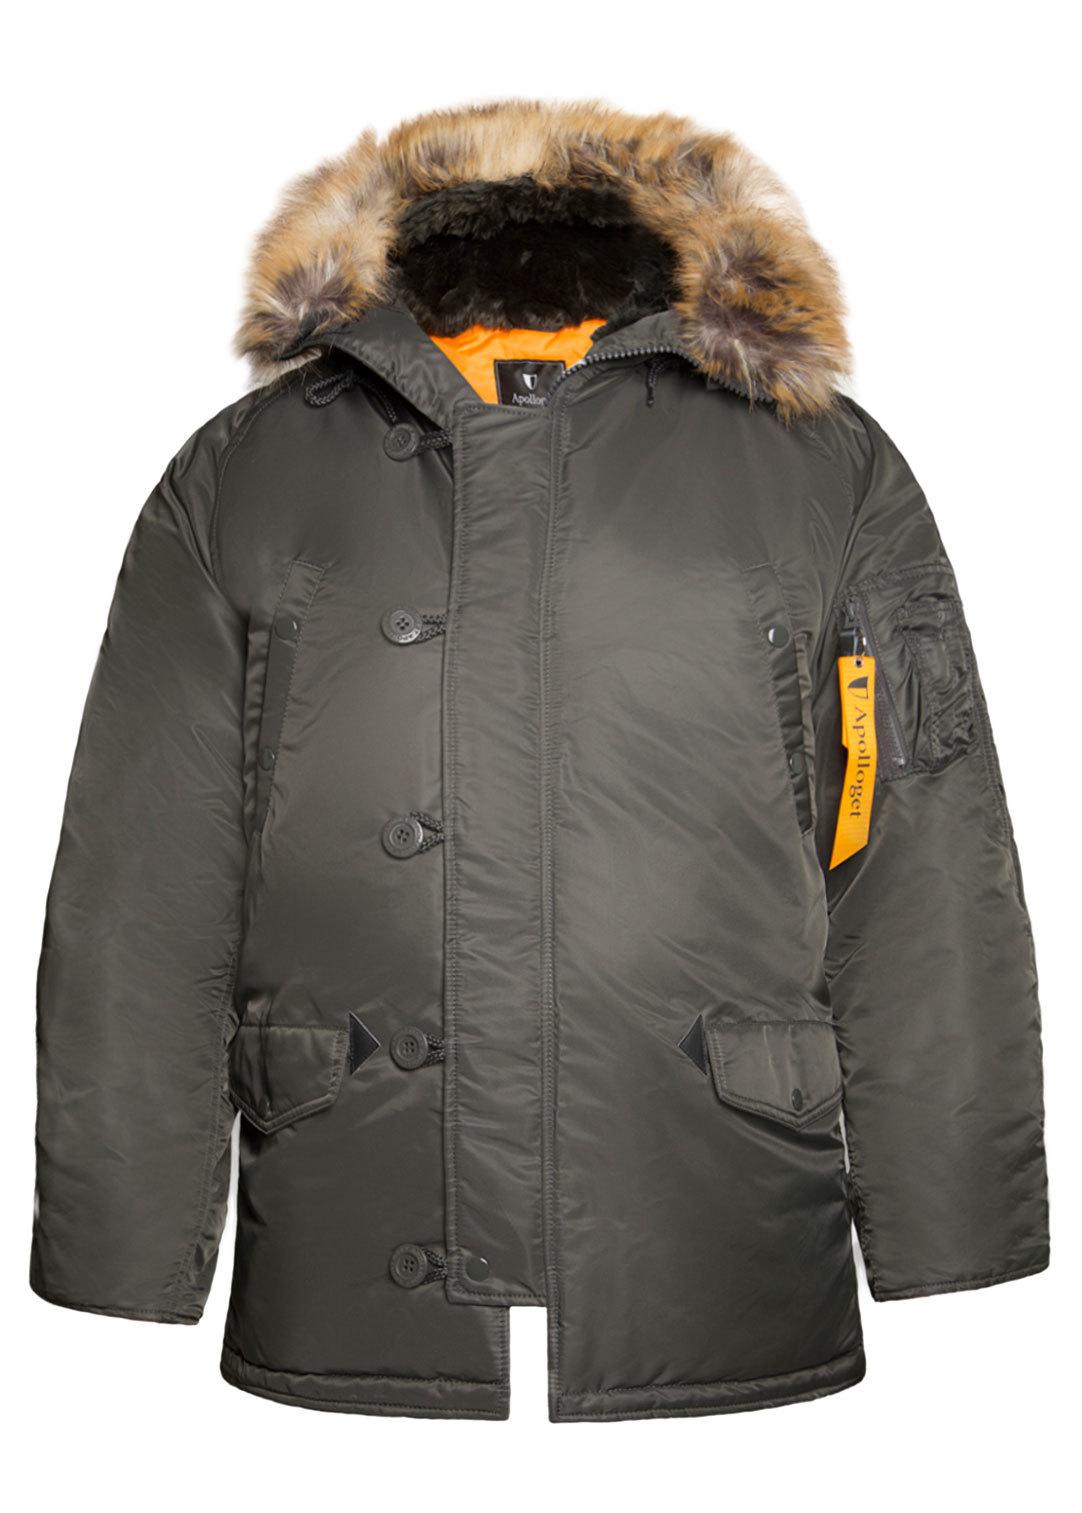 Куртка Аляска  Apolloget N-3B Regular (т.серая - beluga/orange)